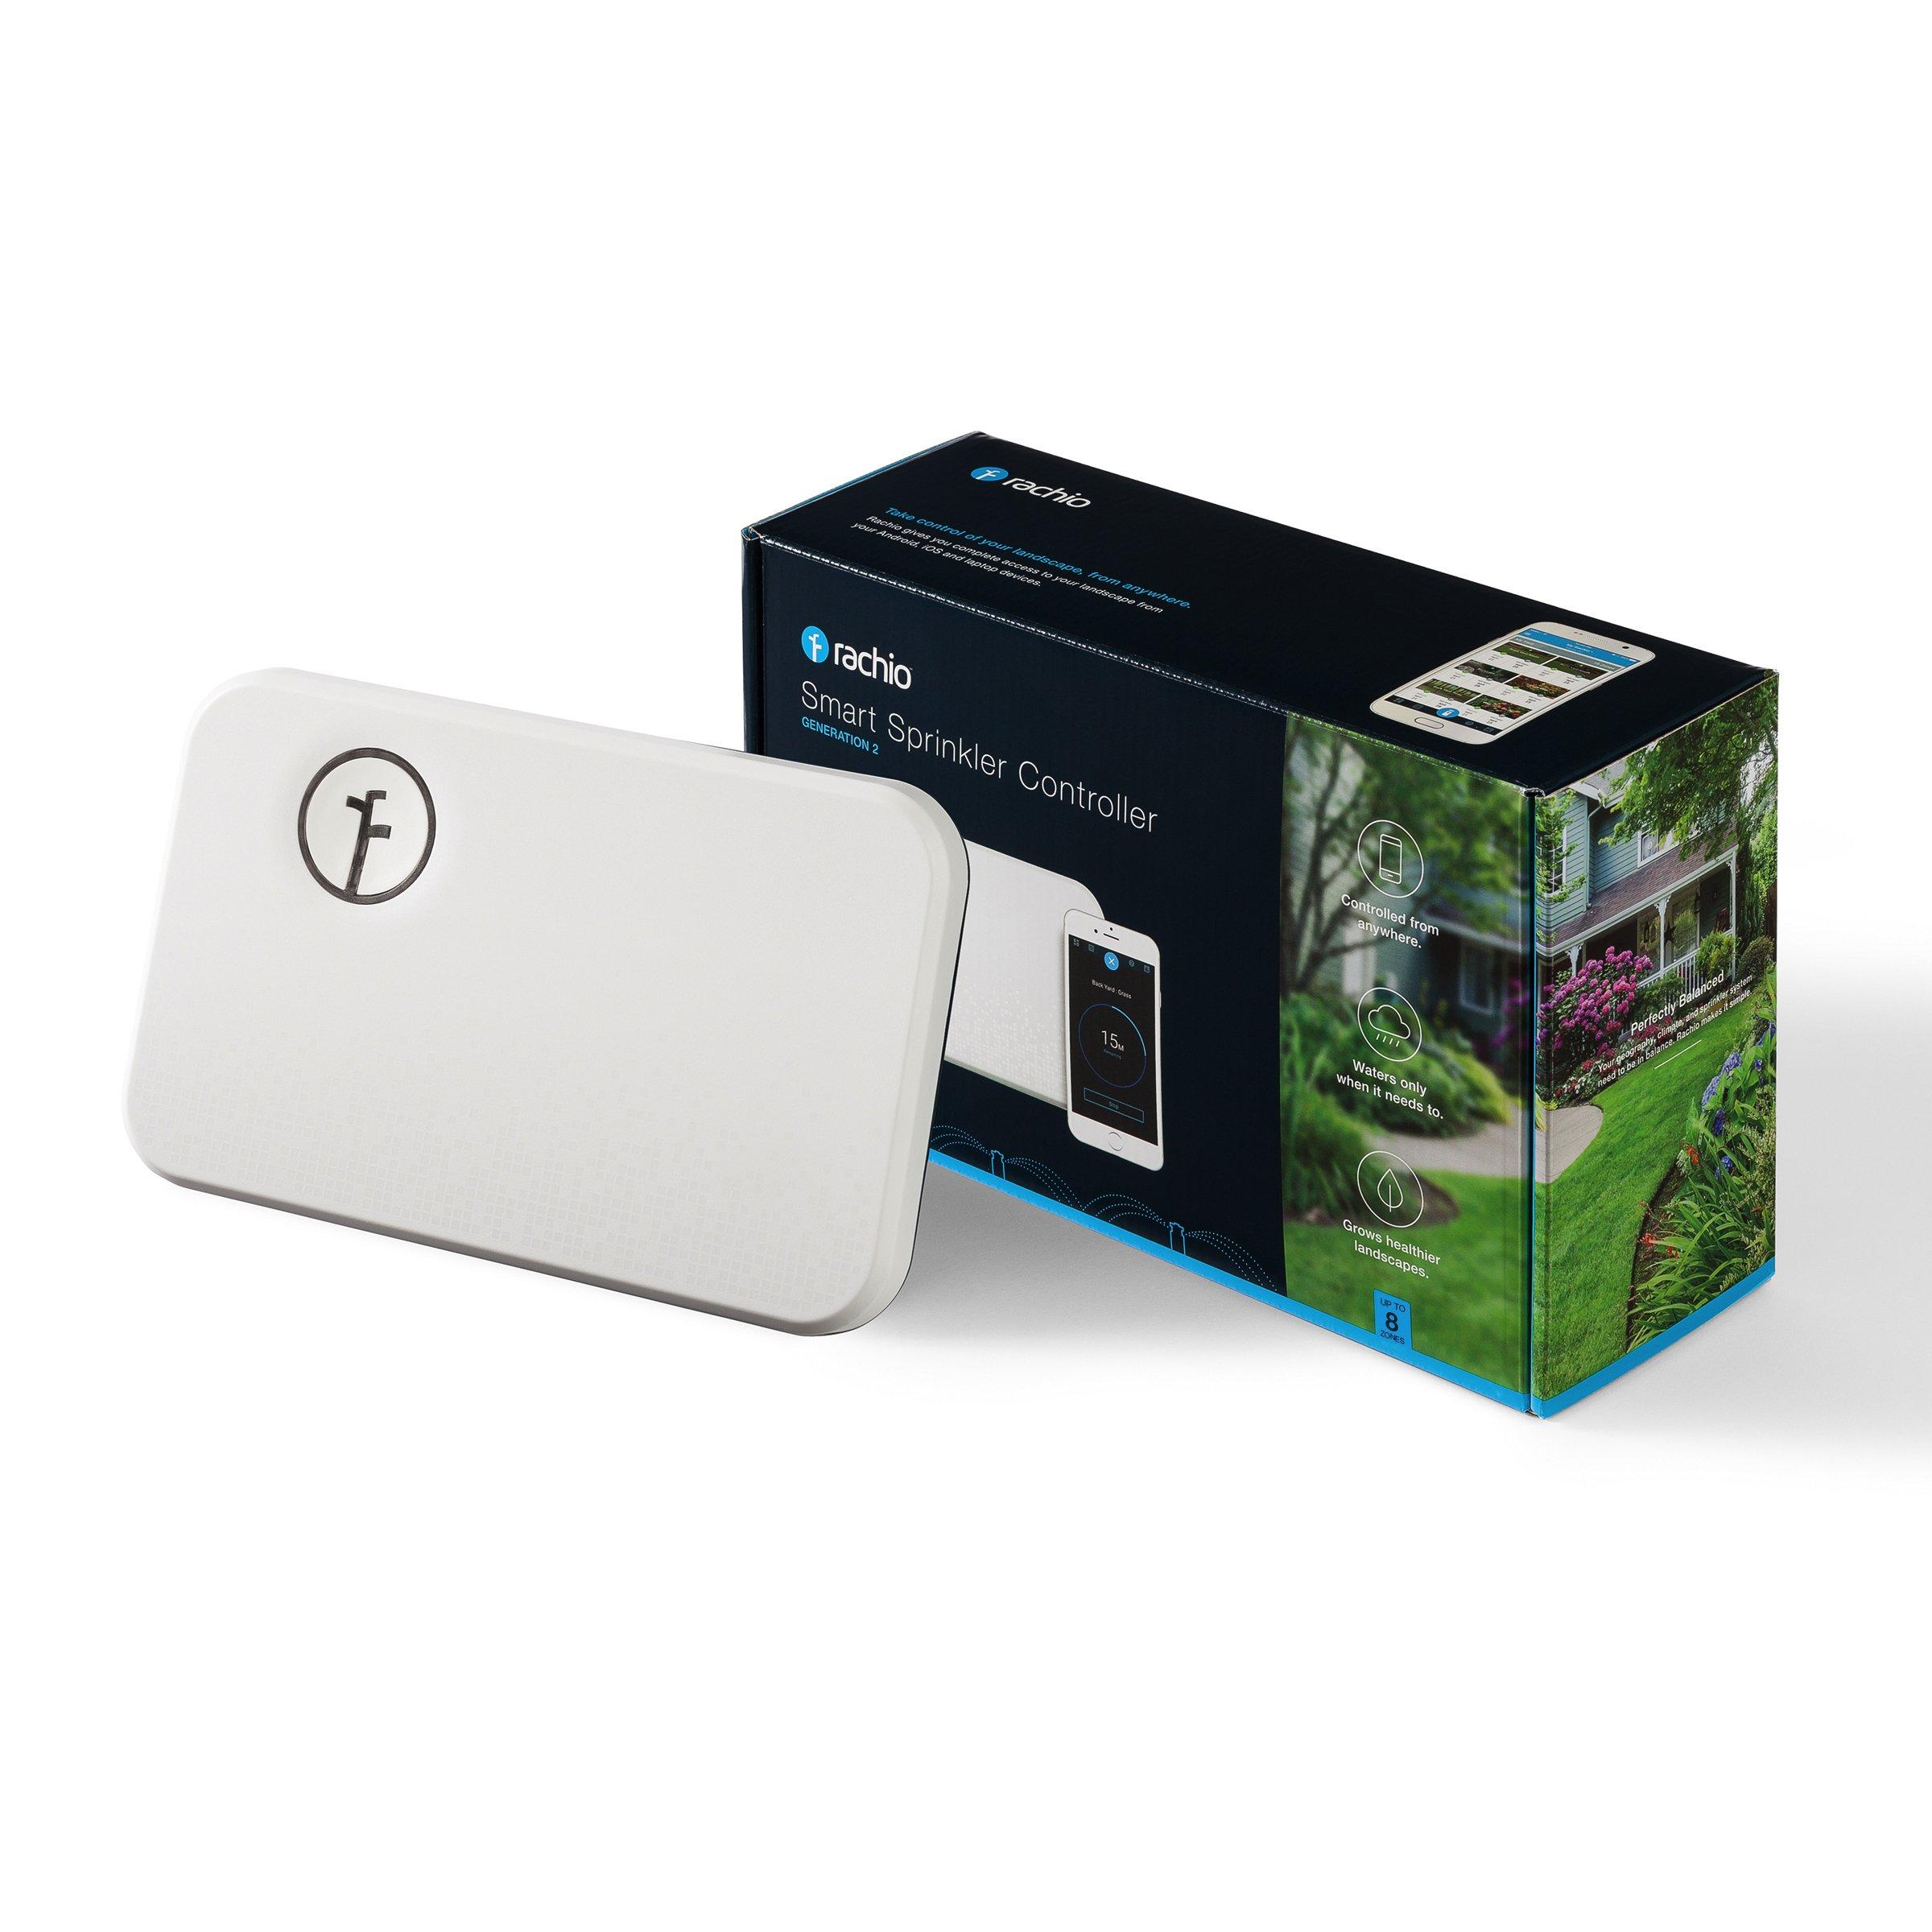 Rachio Smart Sprinkler Controller, WiFi, 8 Zone 2nd Generation, Works with Amazon Alexa by Rachio (Image #1)